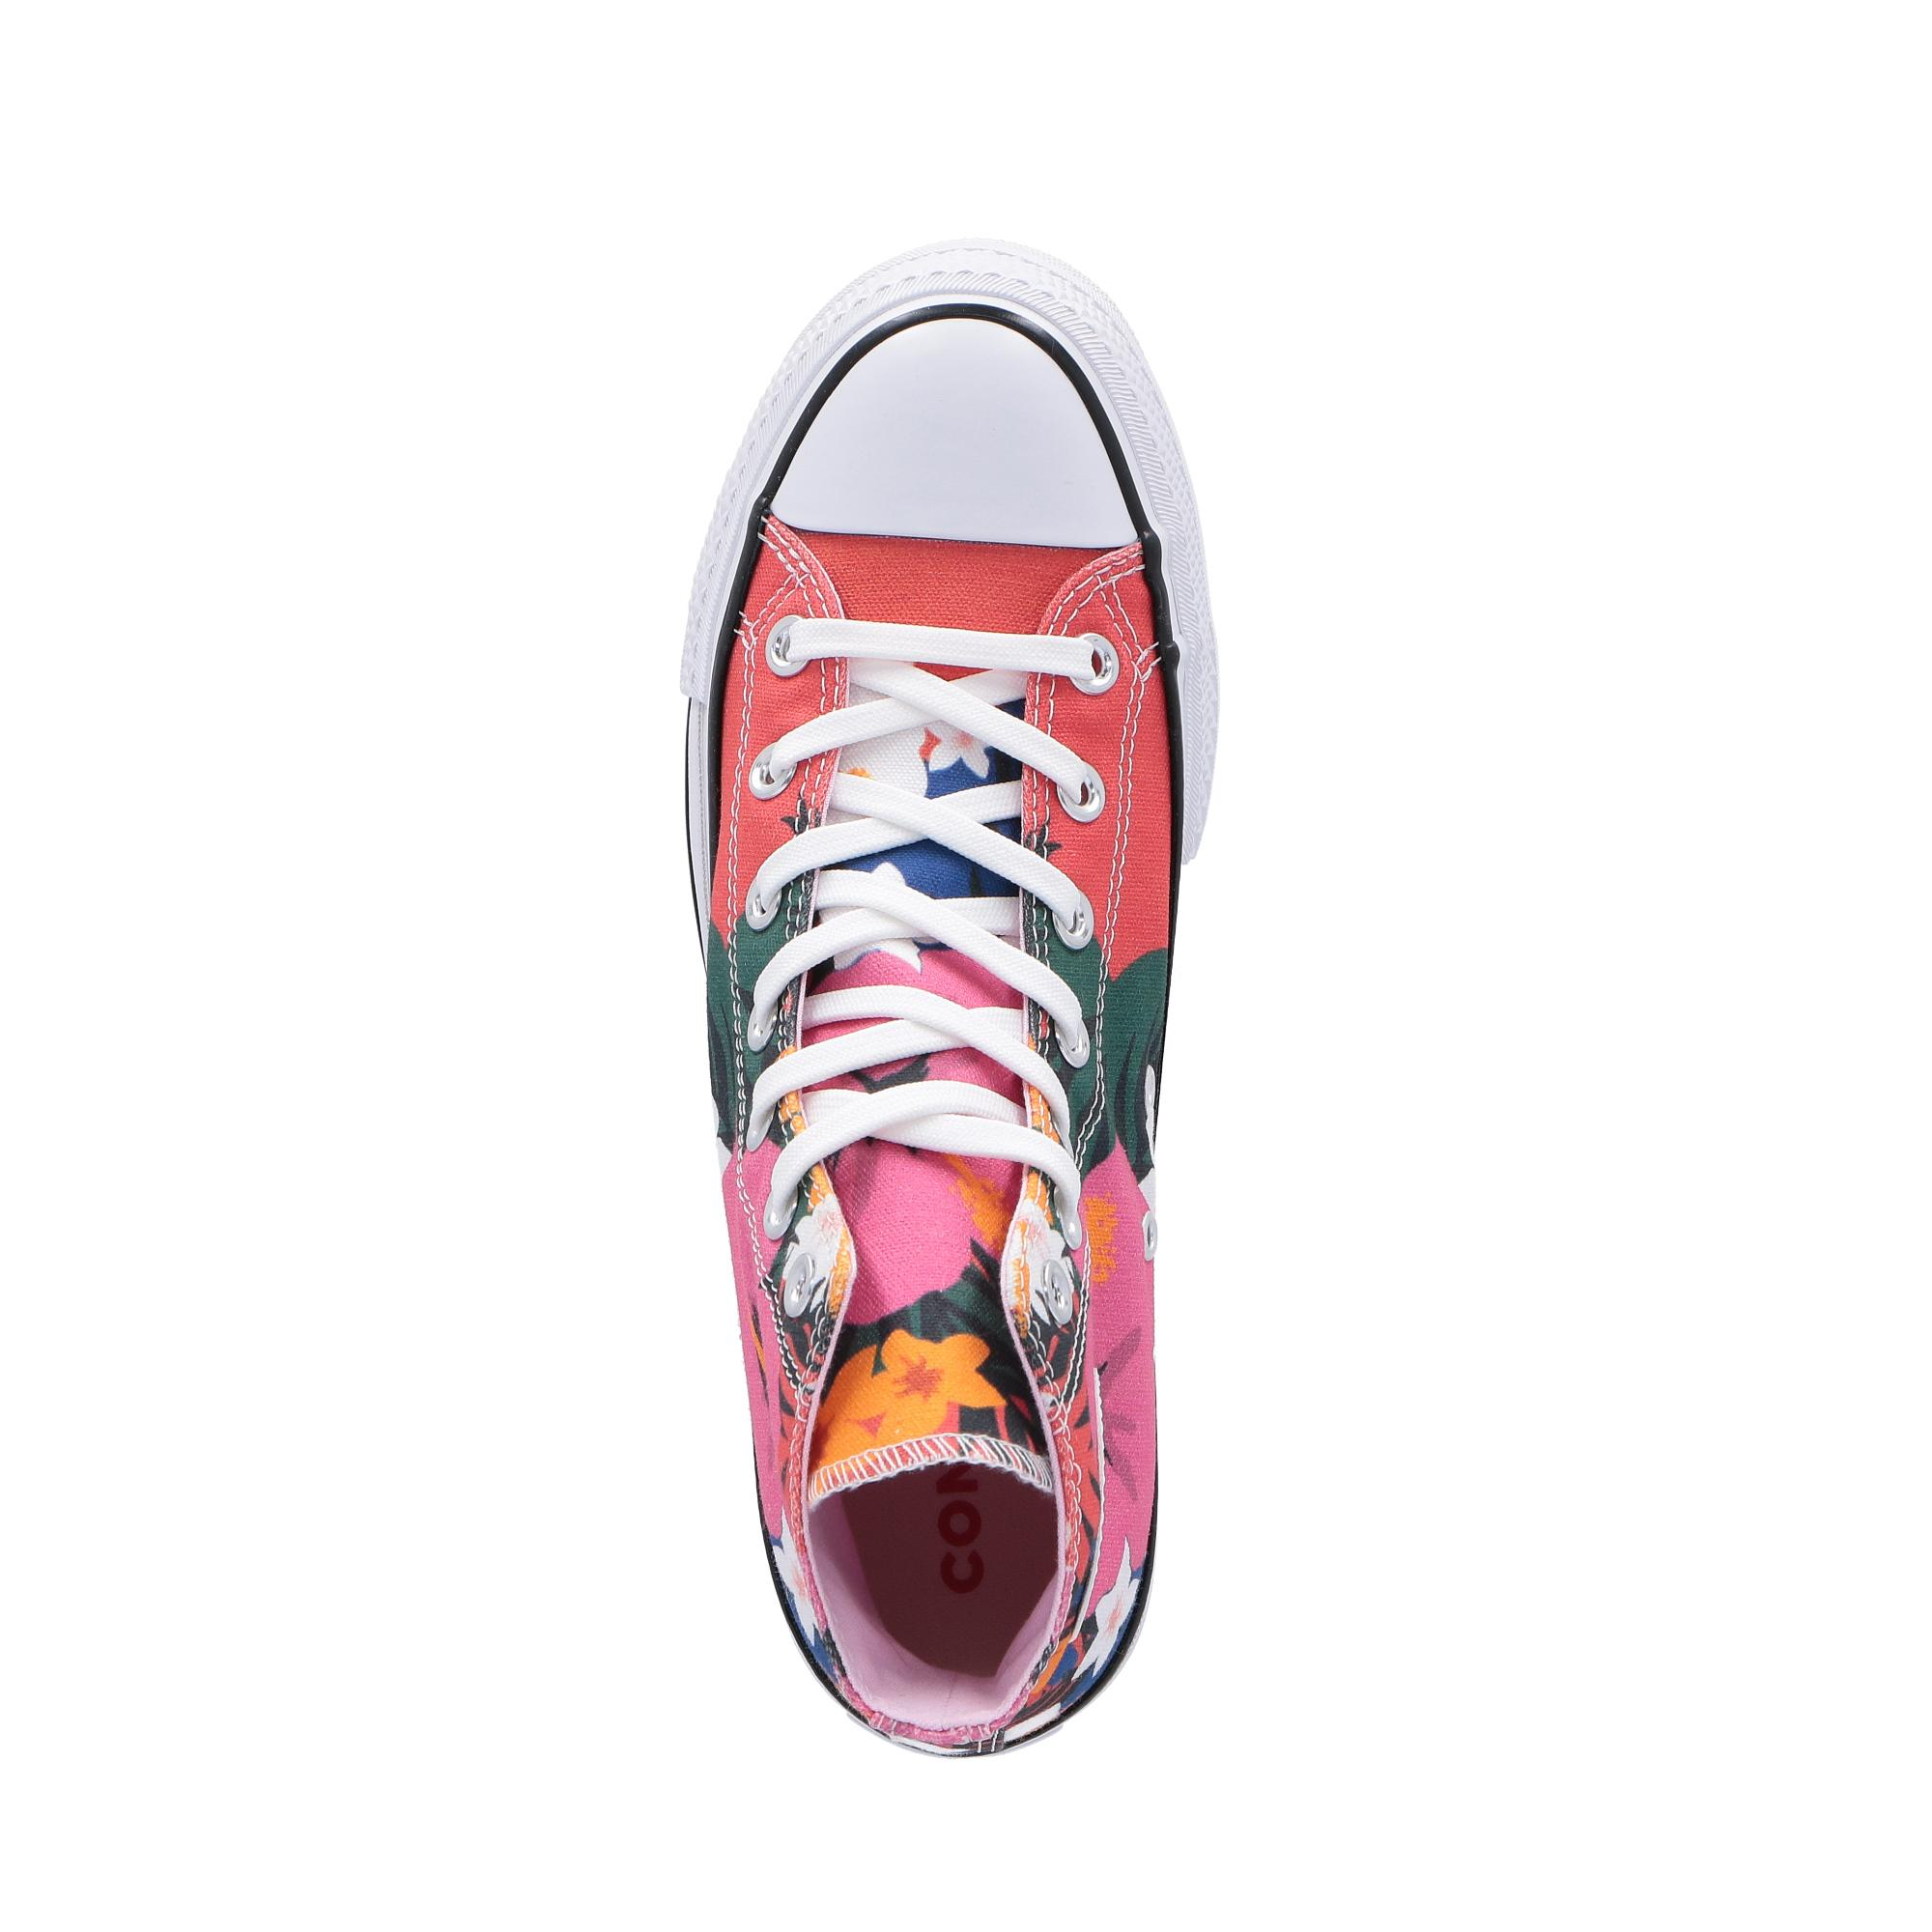 converse strawberry jam